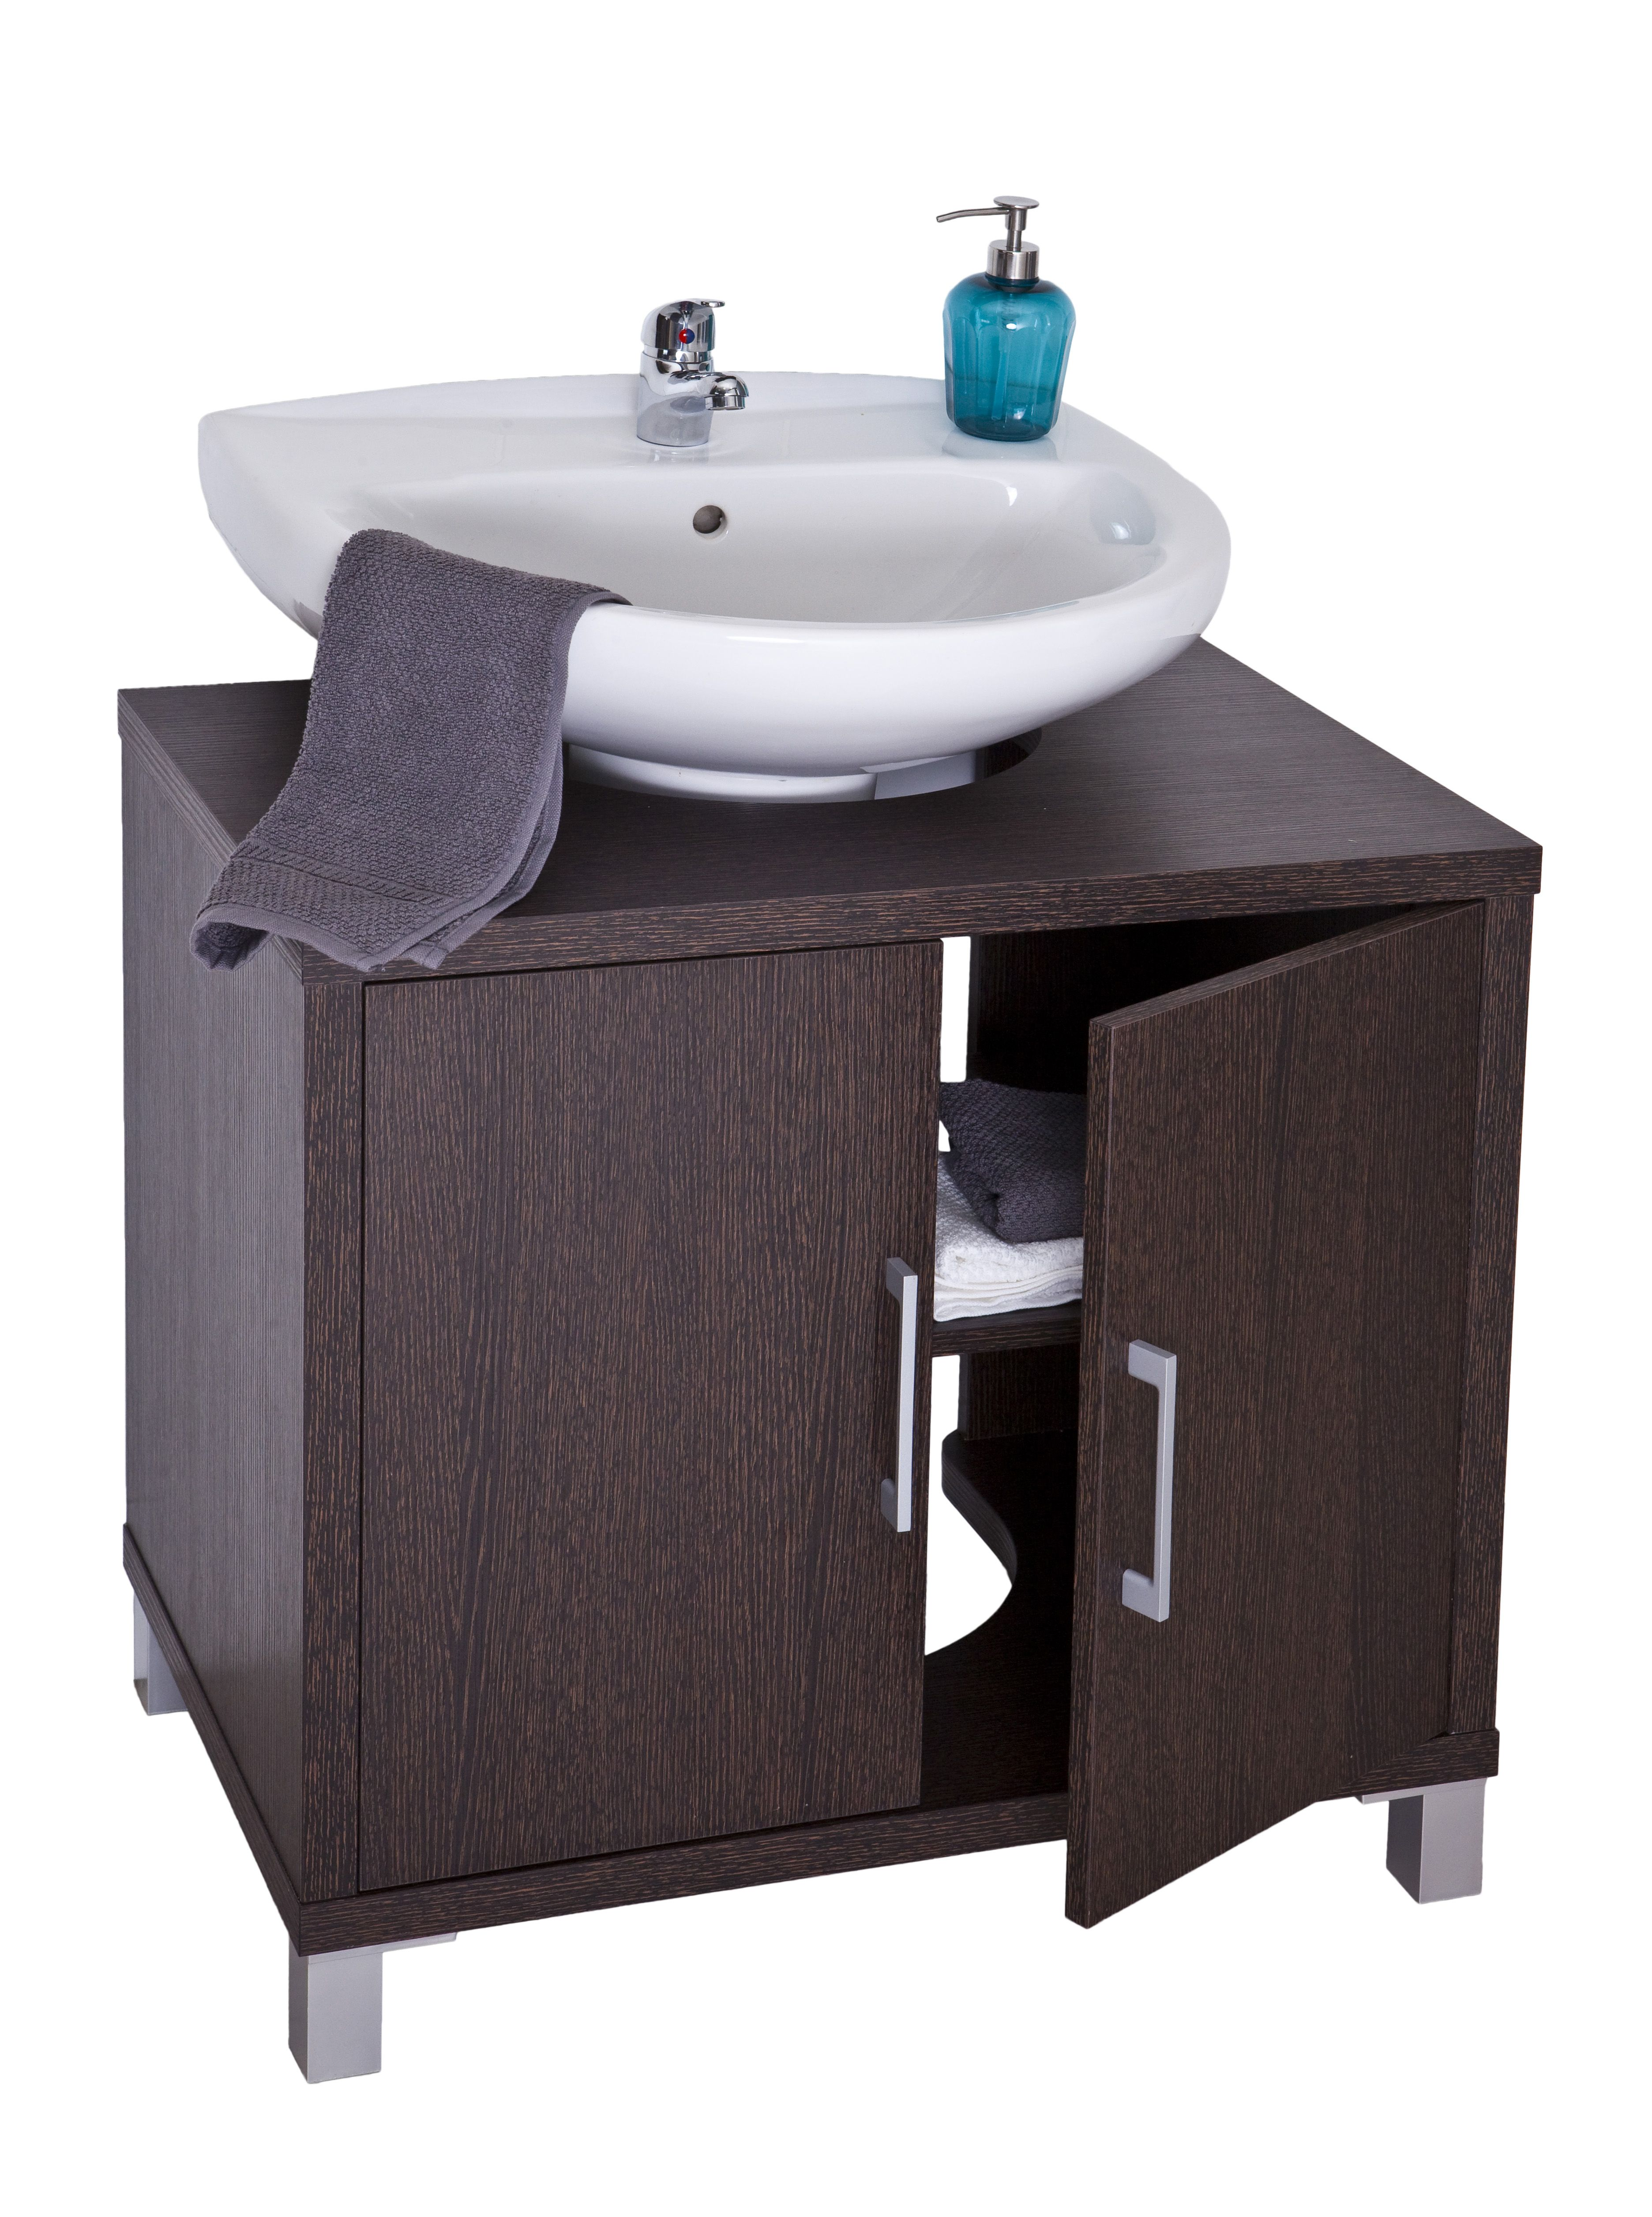 Muebles lavabos para ba os pequenos for Muebles de lavabo